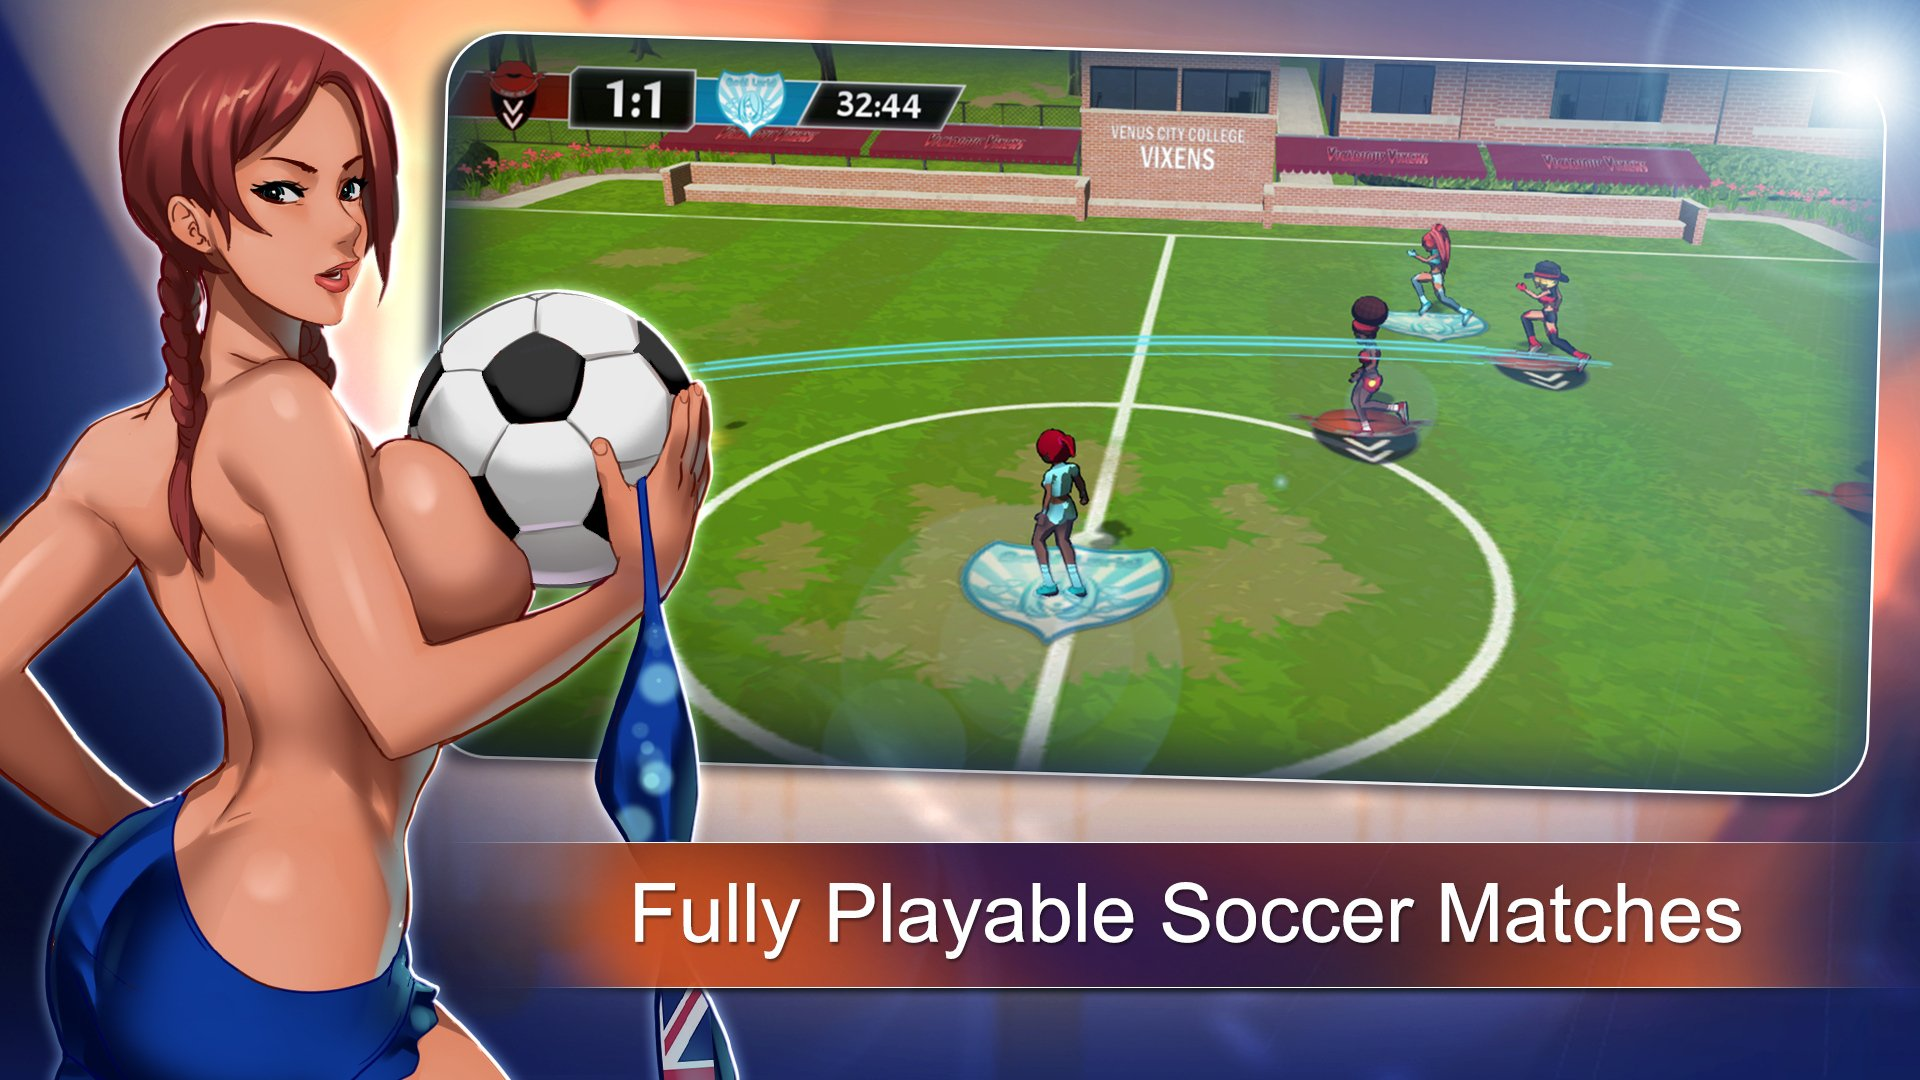 sports Game - Lewd League Soccer